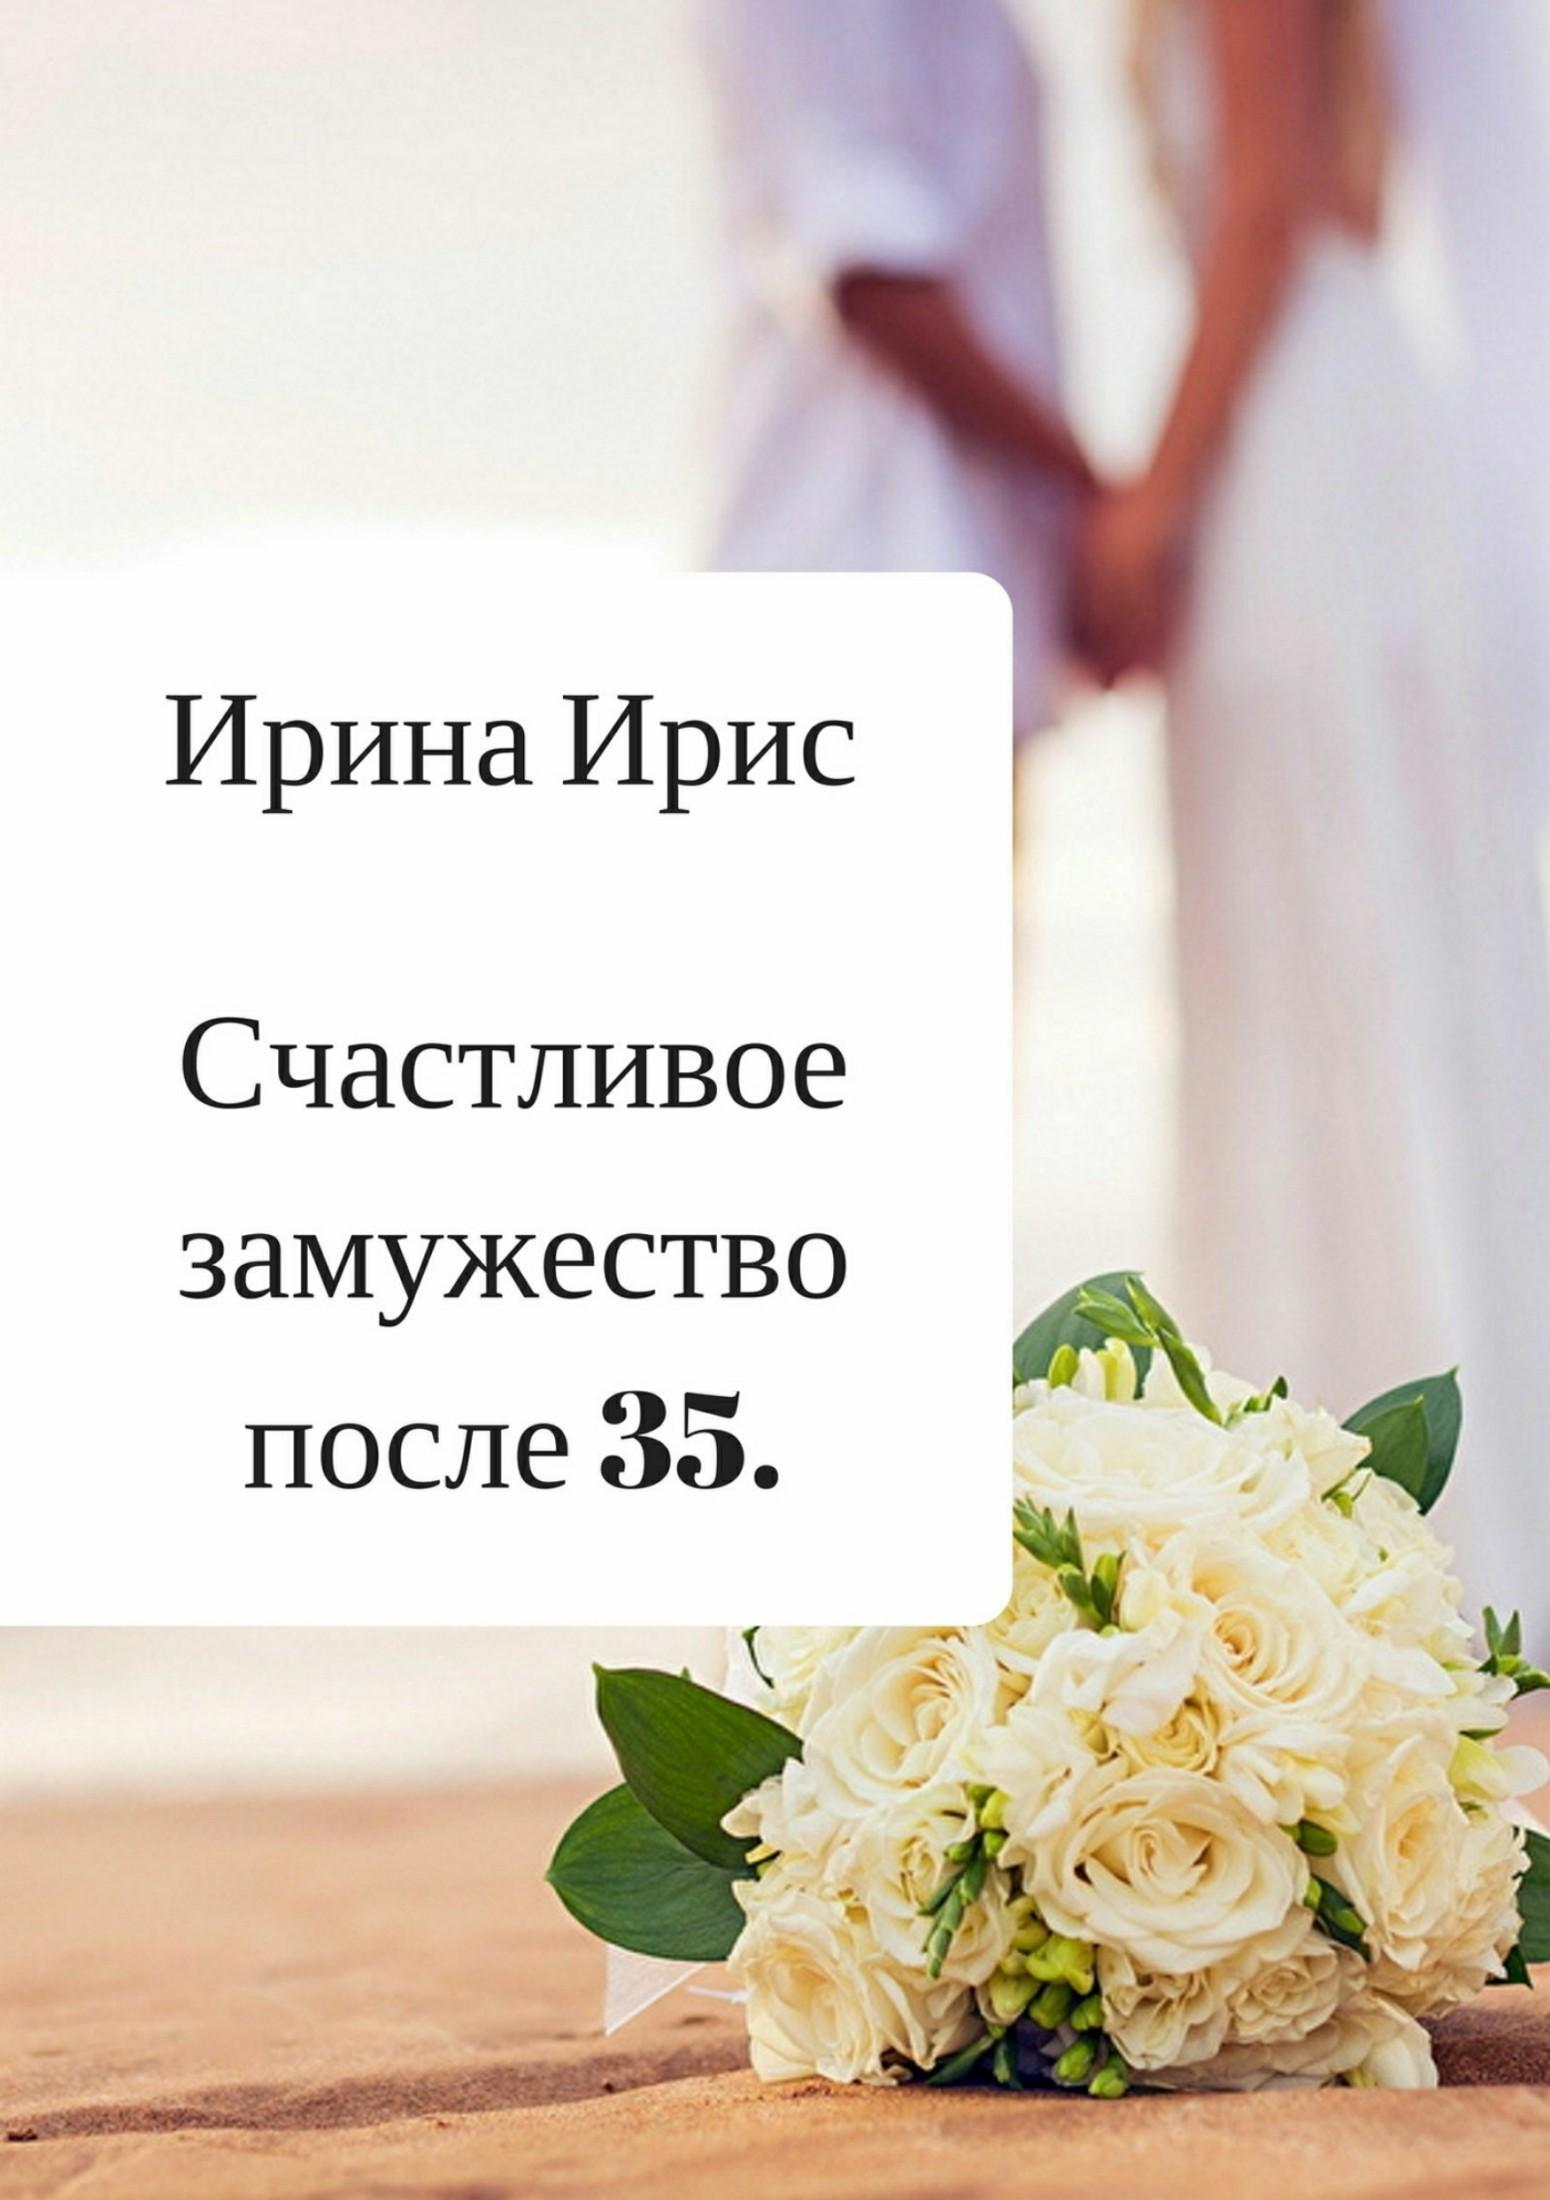 Ирина Ирис Счастливое замужество после 35 алиса майер как найти подходящего мужчину ивыйти замуж как найти подходящего партнерадляжизни